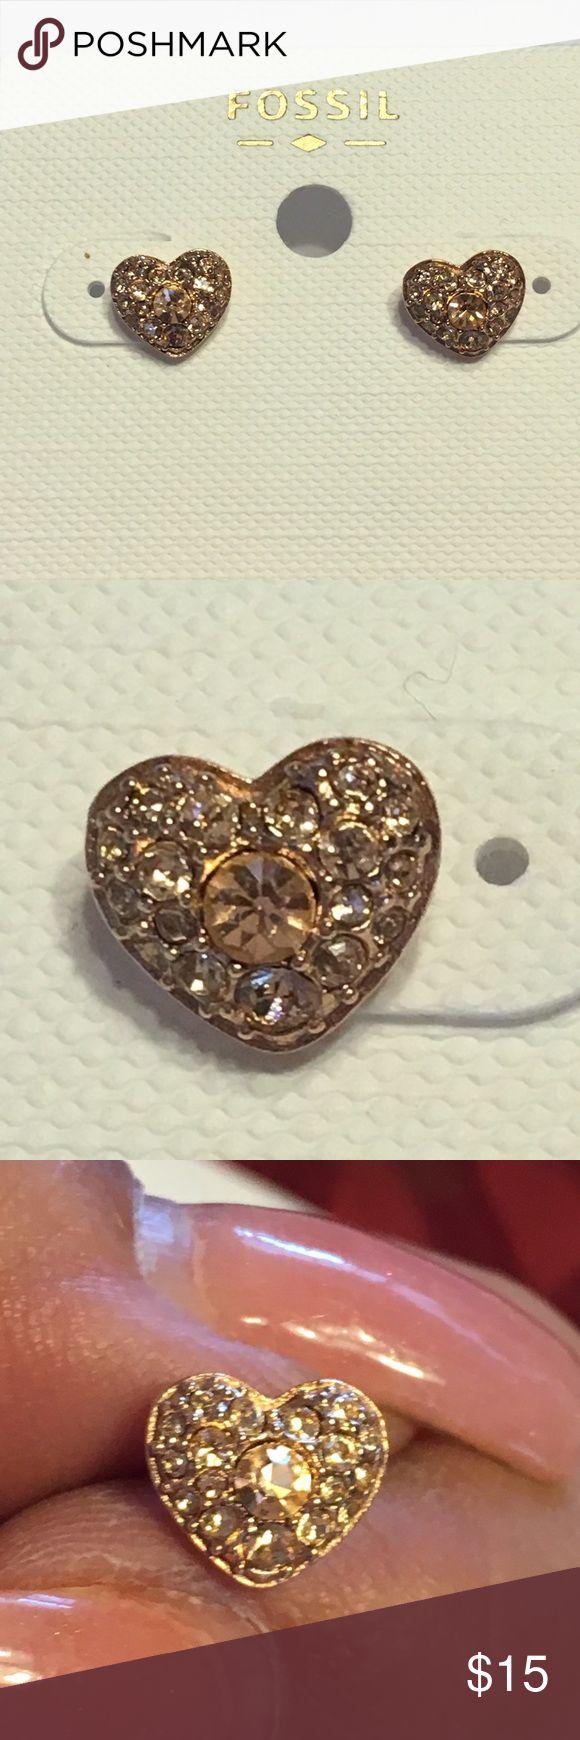 Fossil rose gold heart earrings Dainty rose goldtone heart stud earrings. Fossil Jewelry Earrings